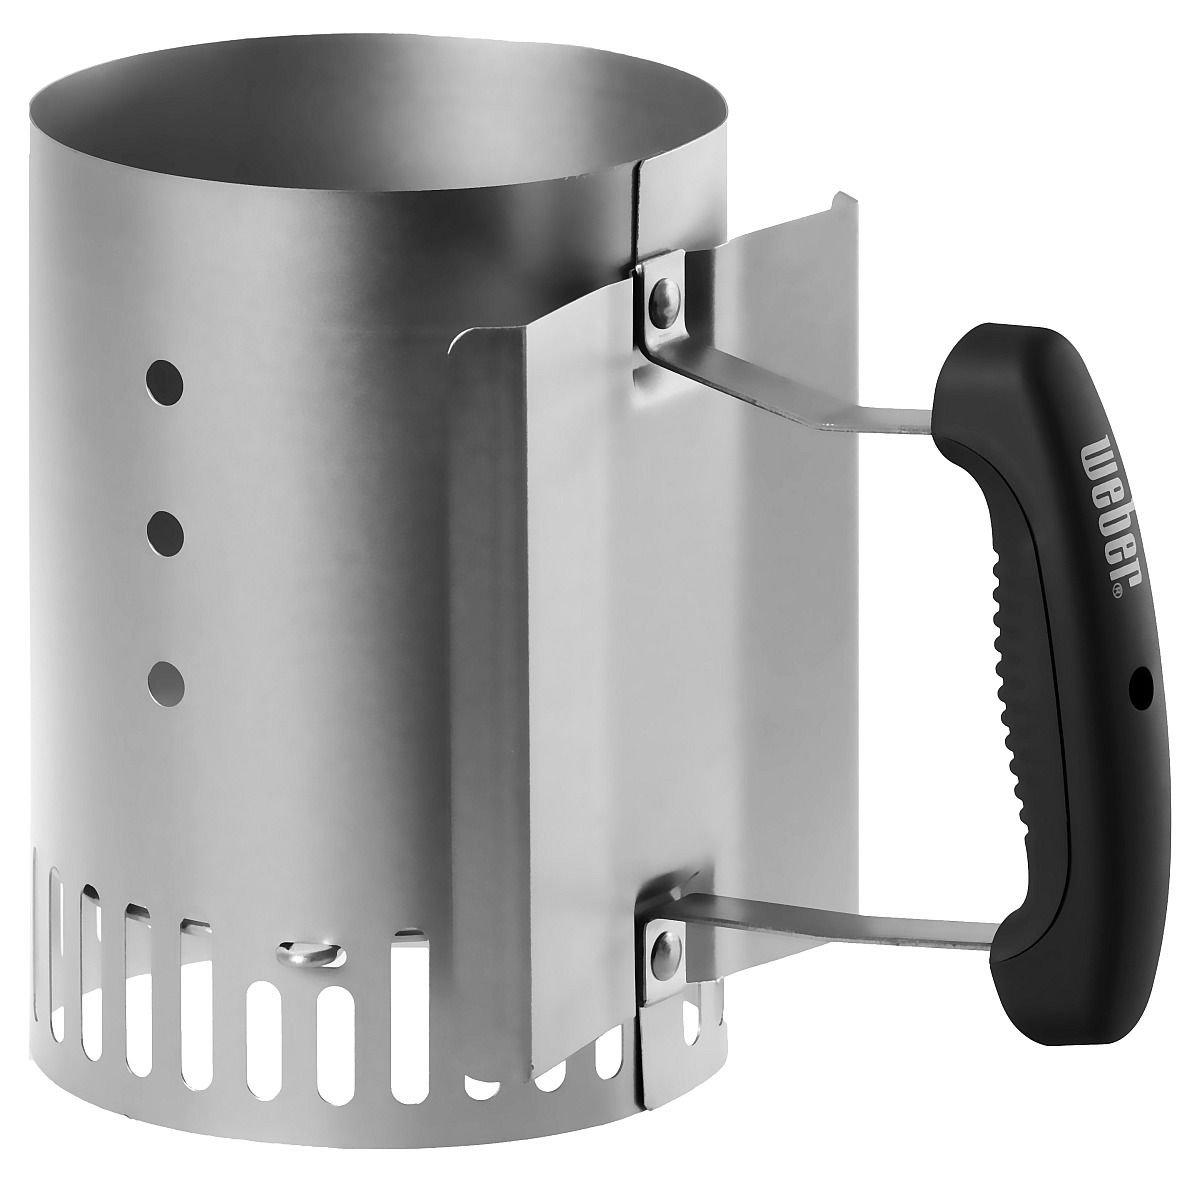 New weber 7447 compact rapidfire chimney starter ebay for Cheminee exterieur weber